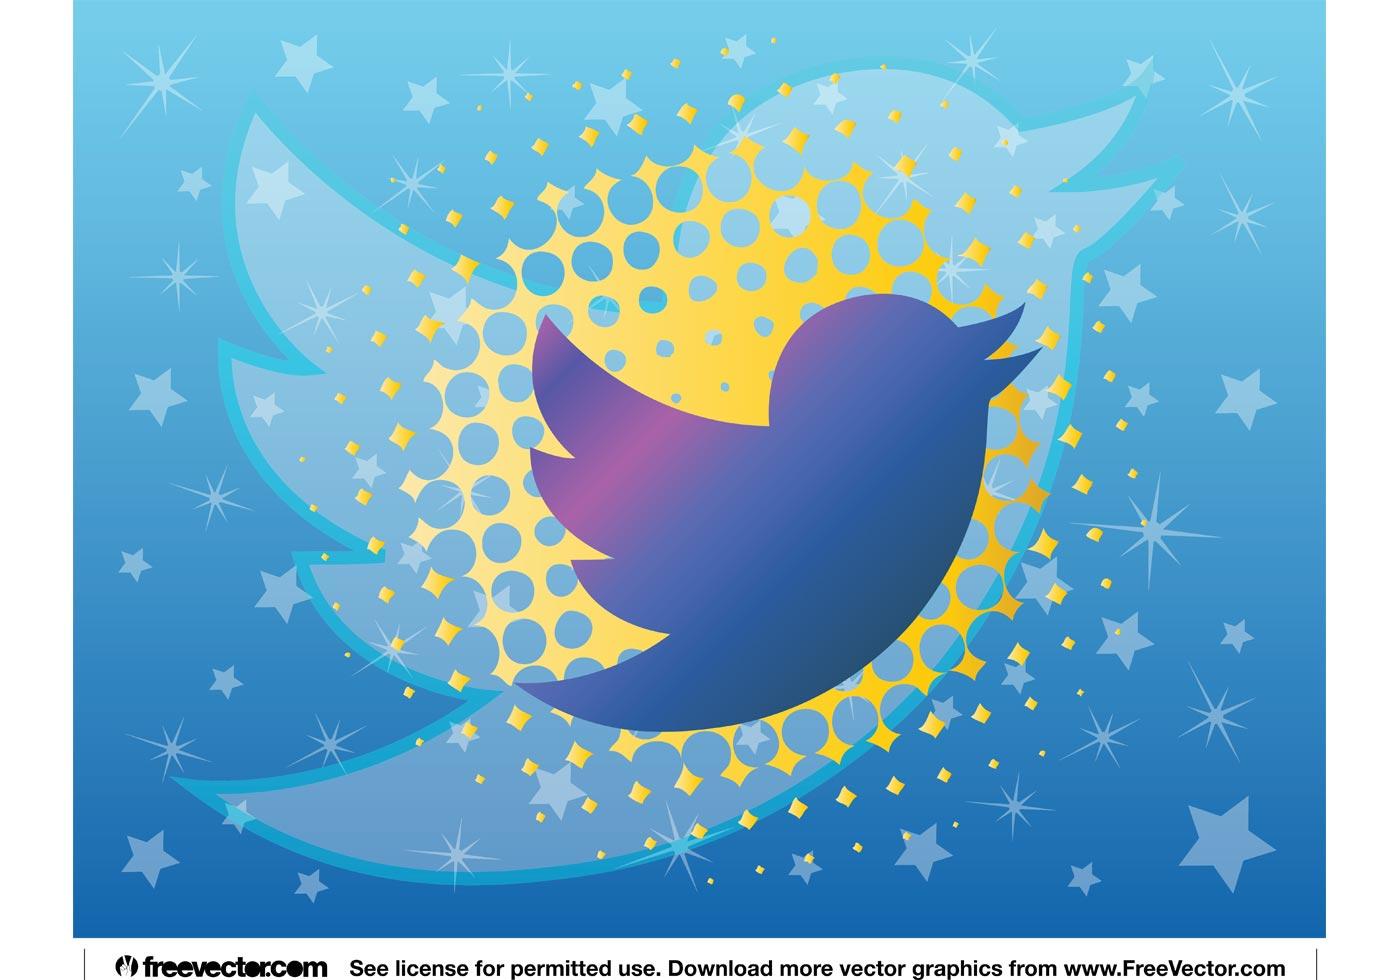 Why Wont Twitter Treat White Supremacy Like ISIS? | Portside